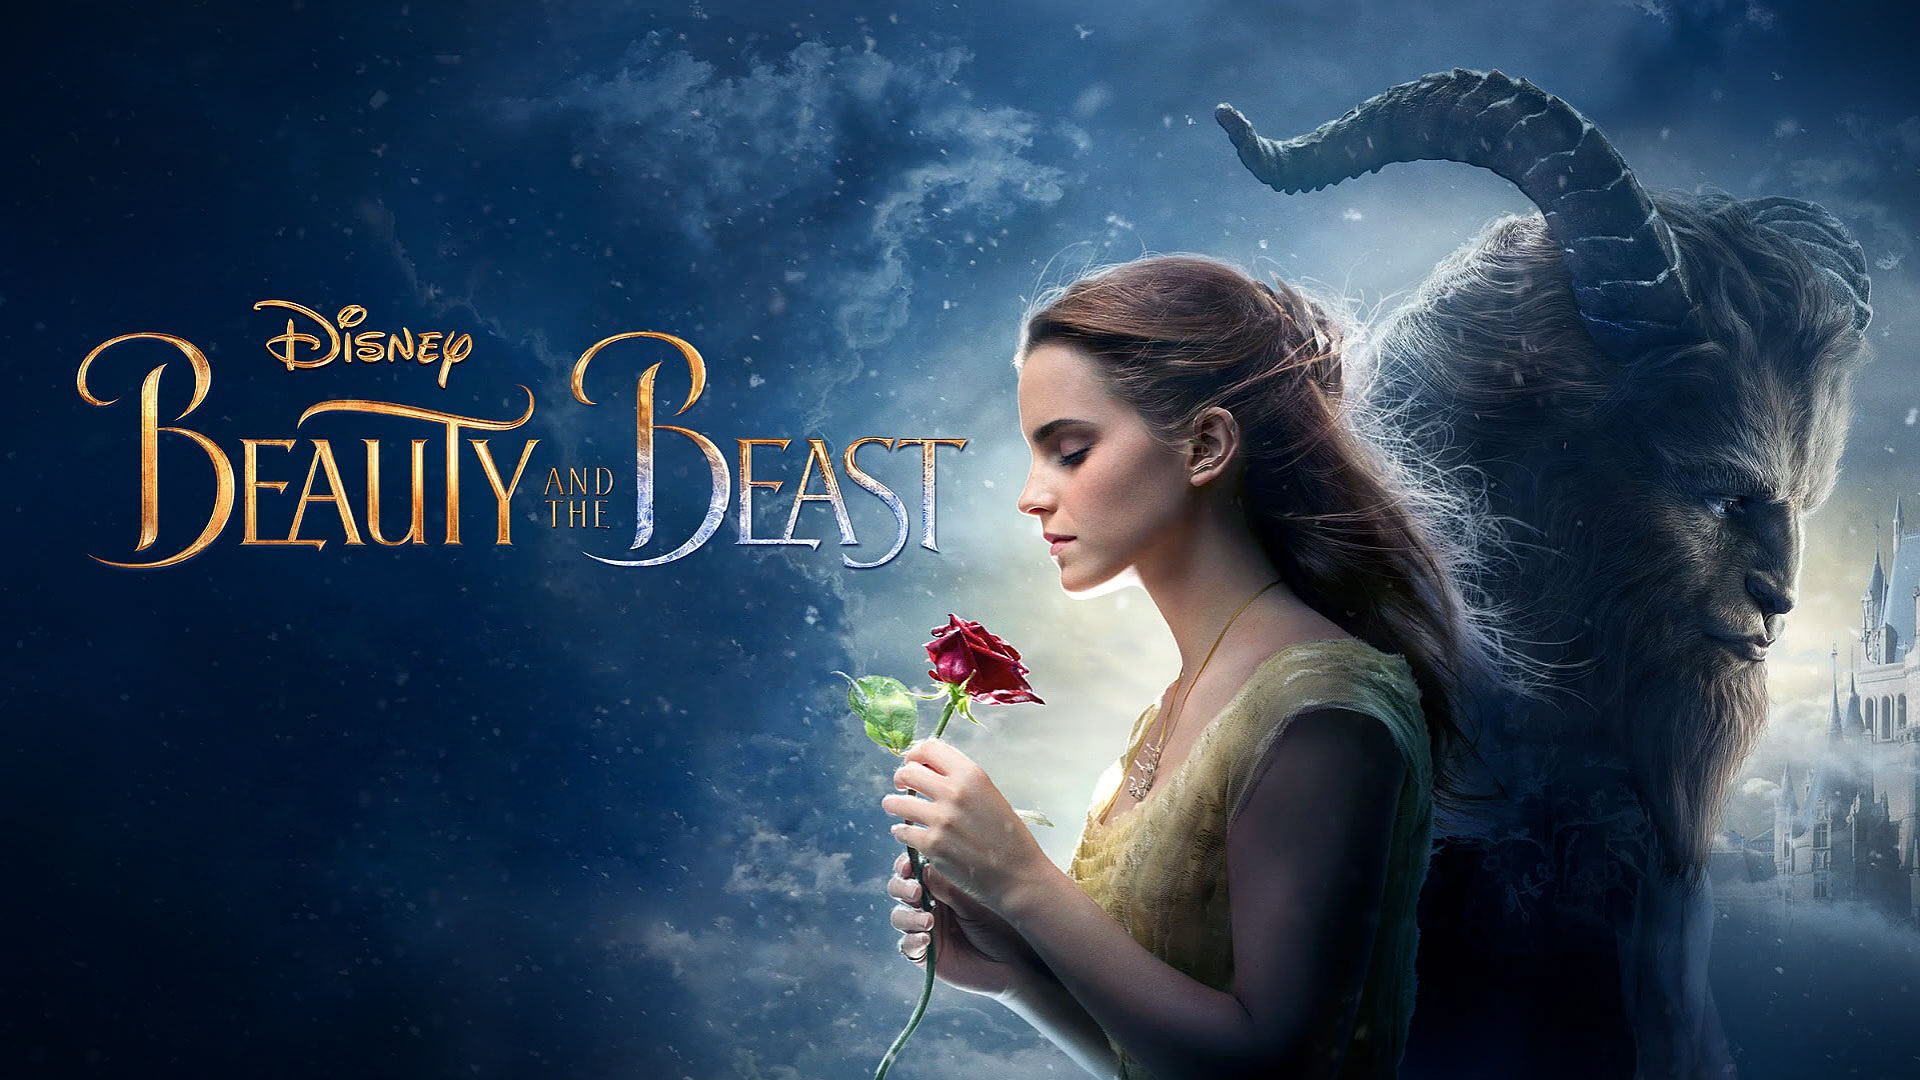 Wallpaper Beauty And The Beast Disney Movie 1920x1080 Full Hd 2k